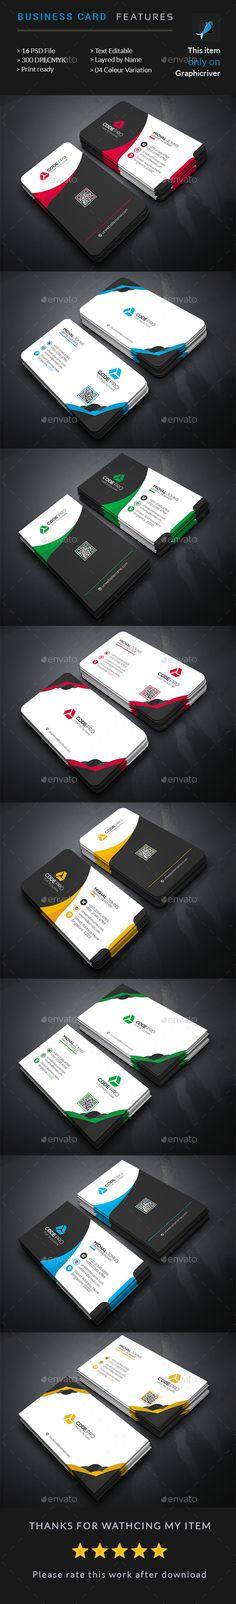 Corporate Business Card Bundle — Photoshop PSD #designer #landscape • Available here → https://graphicriver.net/item/corporate-business-card-bundle/15488040?ref=pxcr